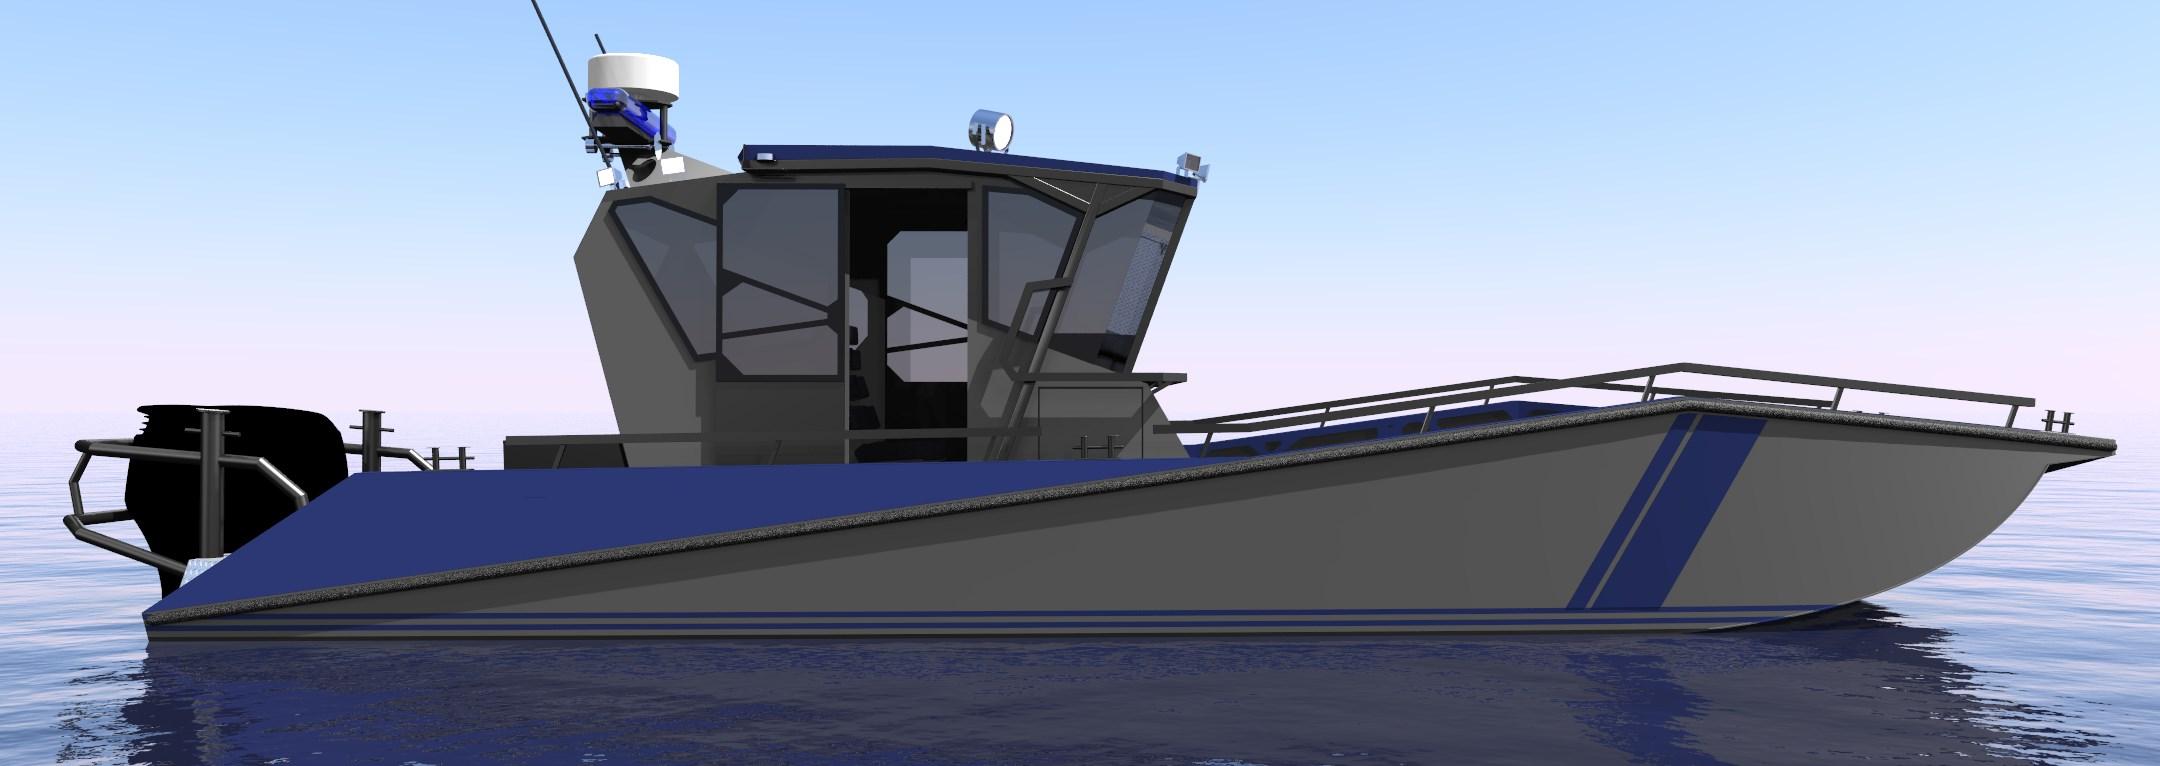 Border guard boat